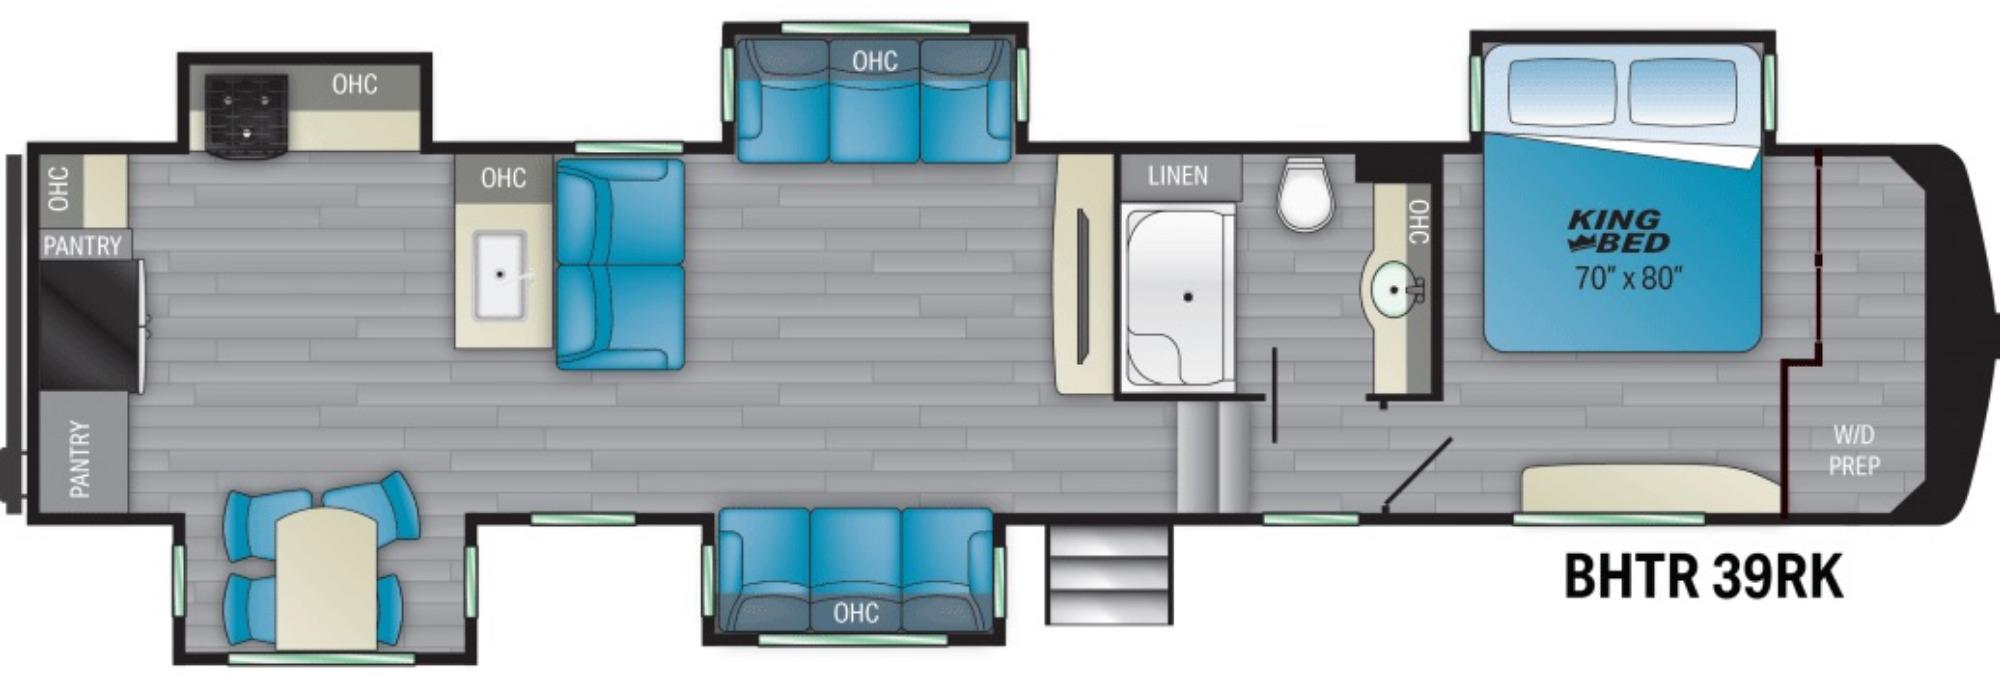 View Floor Plan for 2021 HEARTLAND BIGHORN TRAVELER 39RK